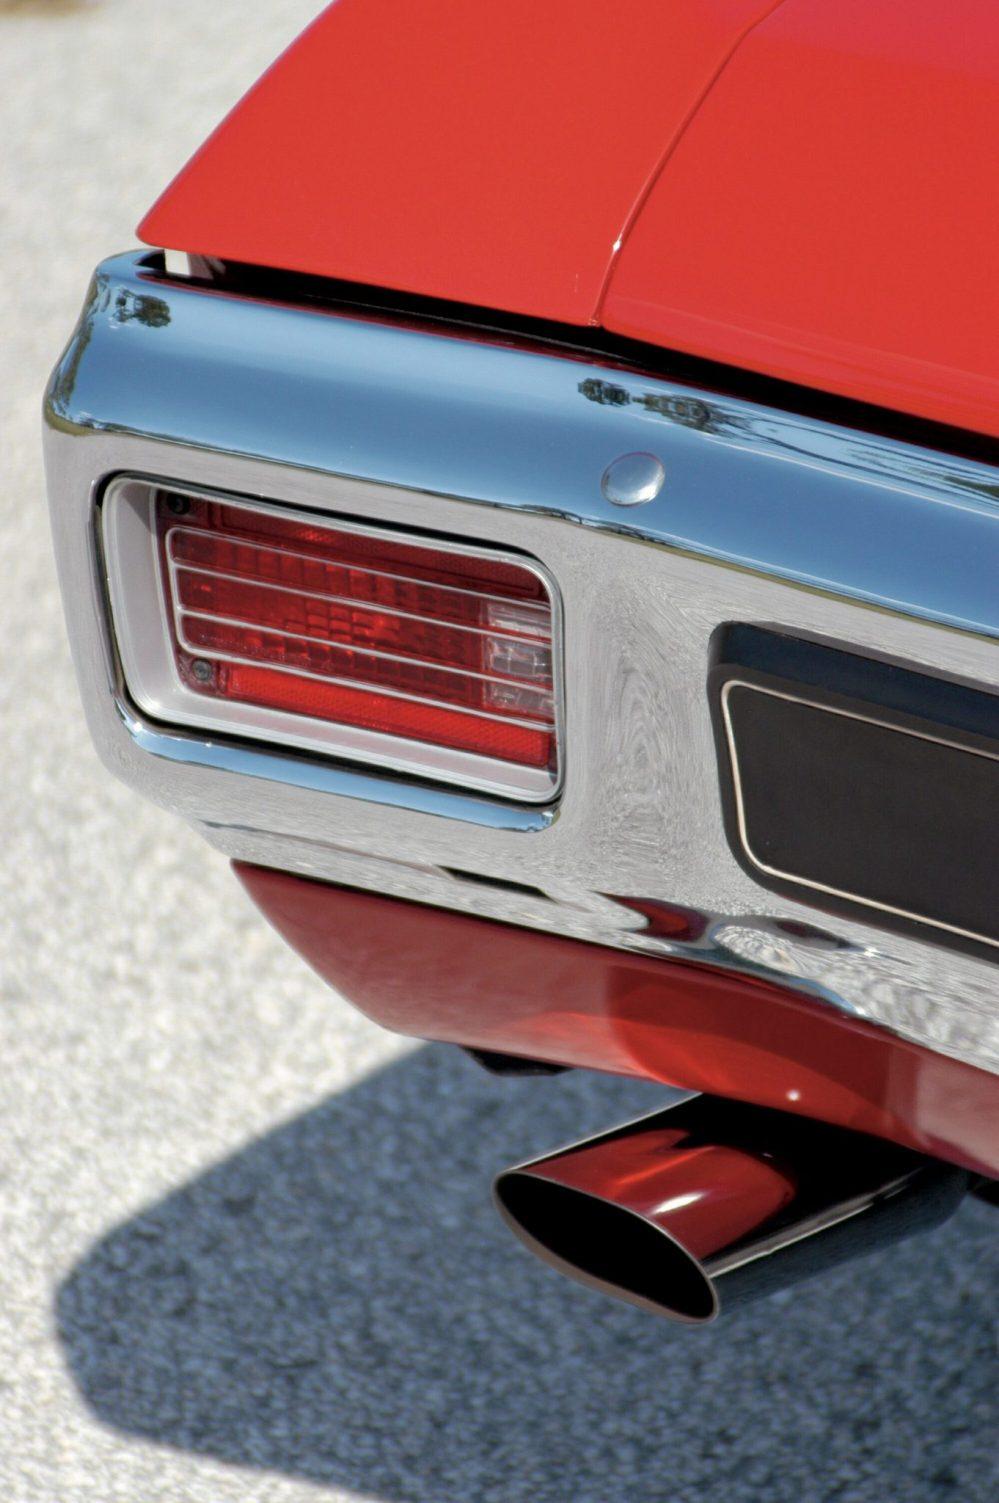 medium resolution of 1970 chevelle ls6 tail light close up